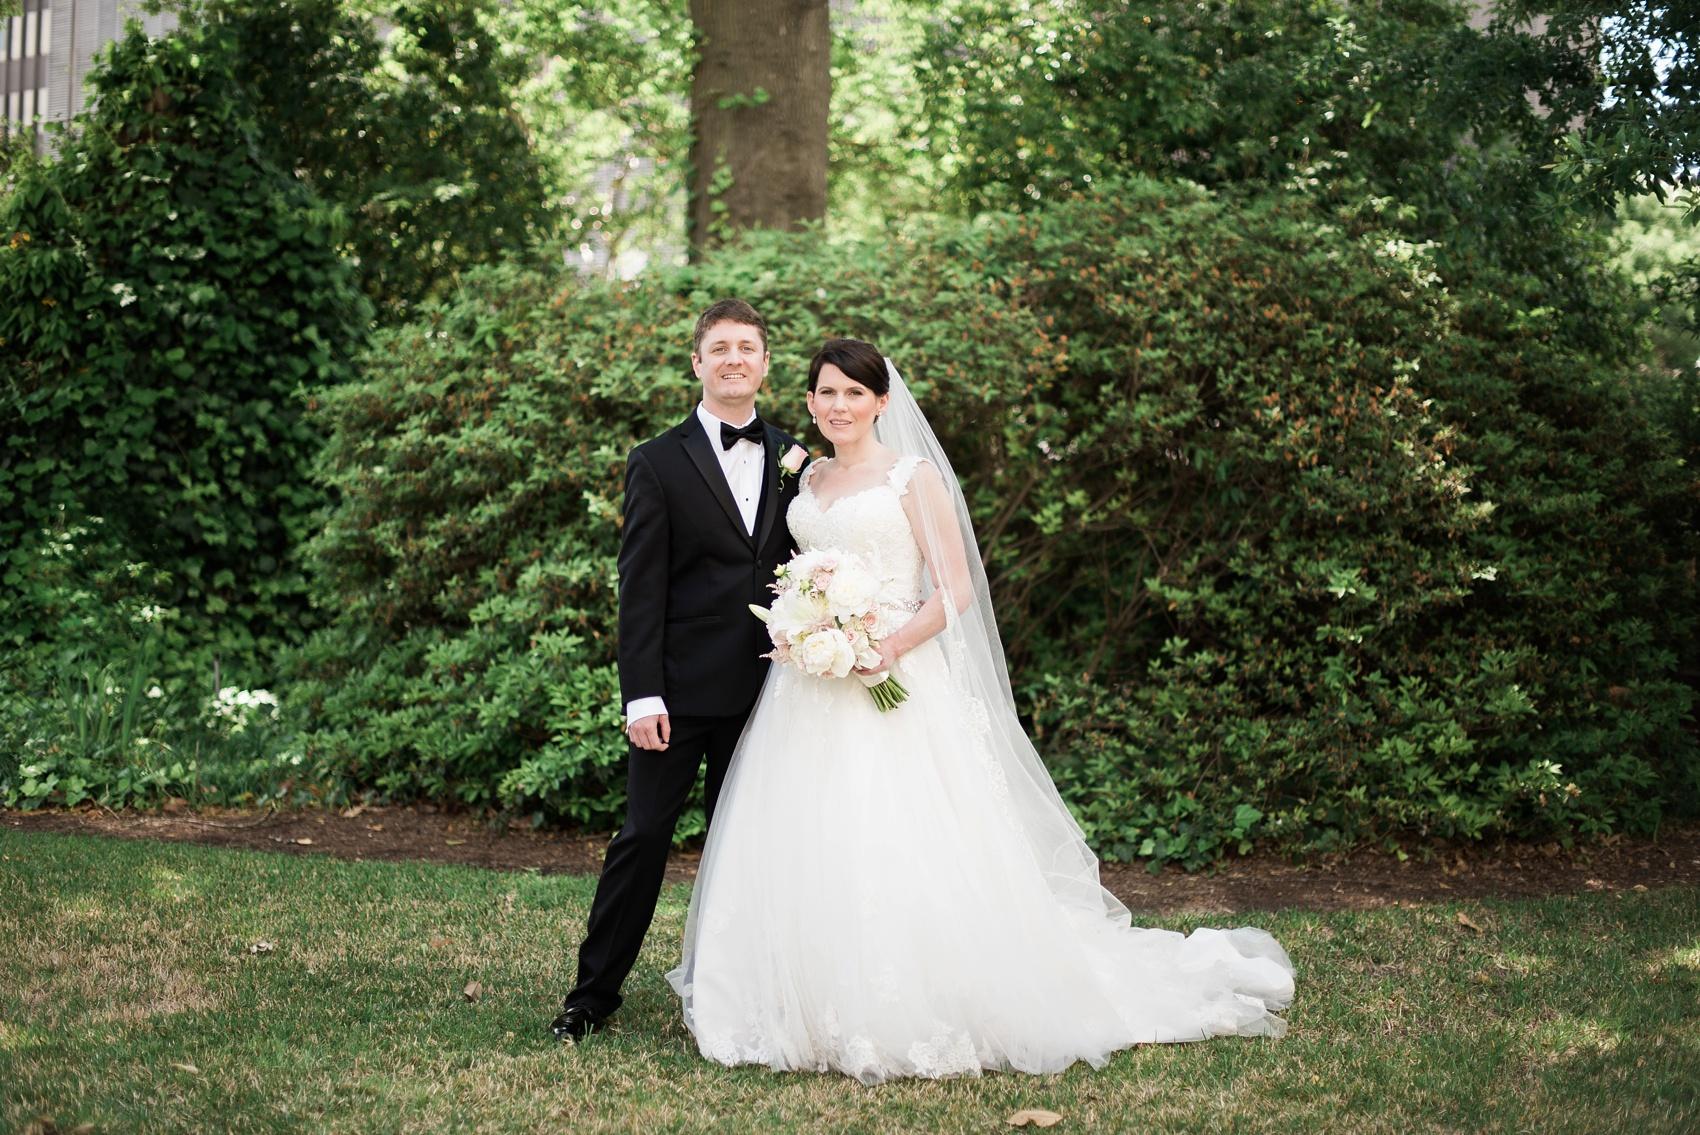 augusta_wedding_photographer_0045.jpg